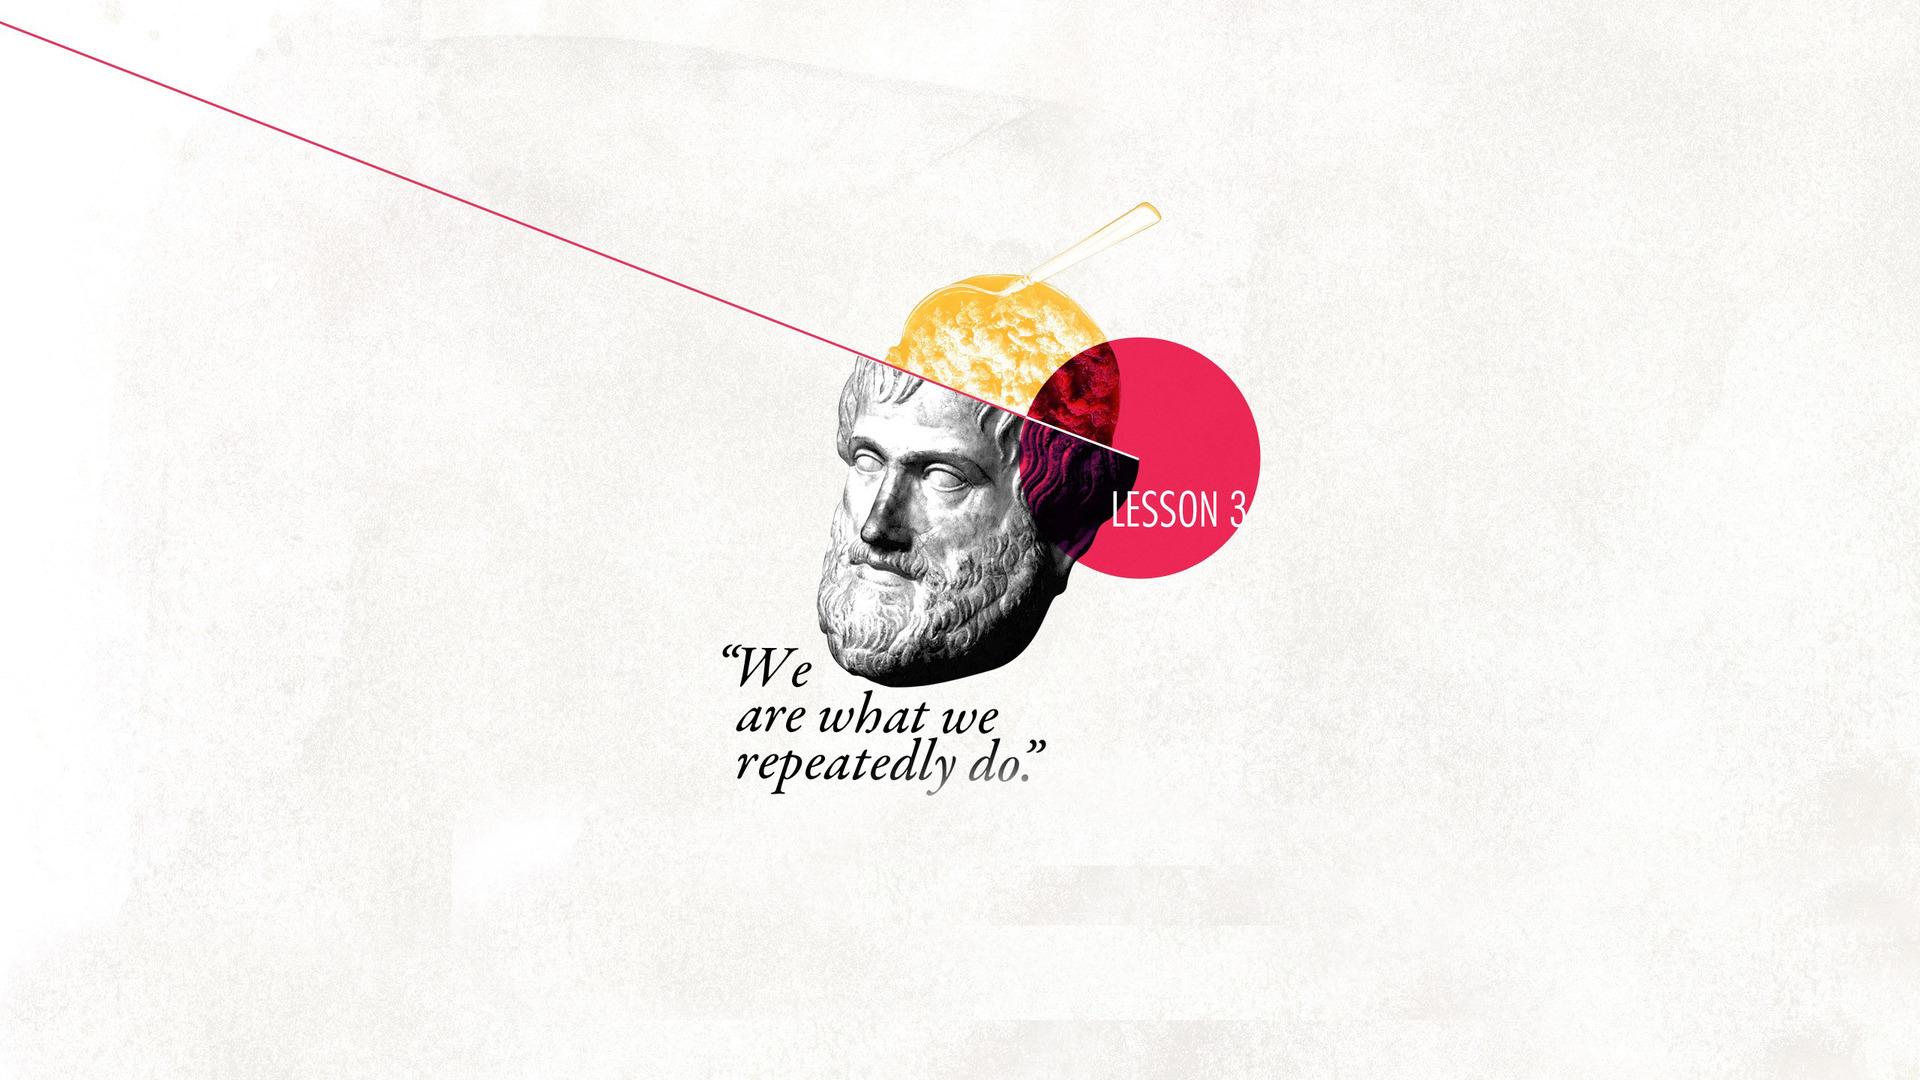 Philosophical quote Wallpaper 8144 1920x1080